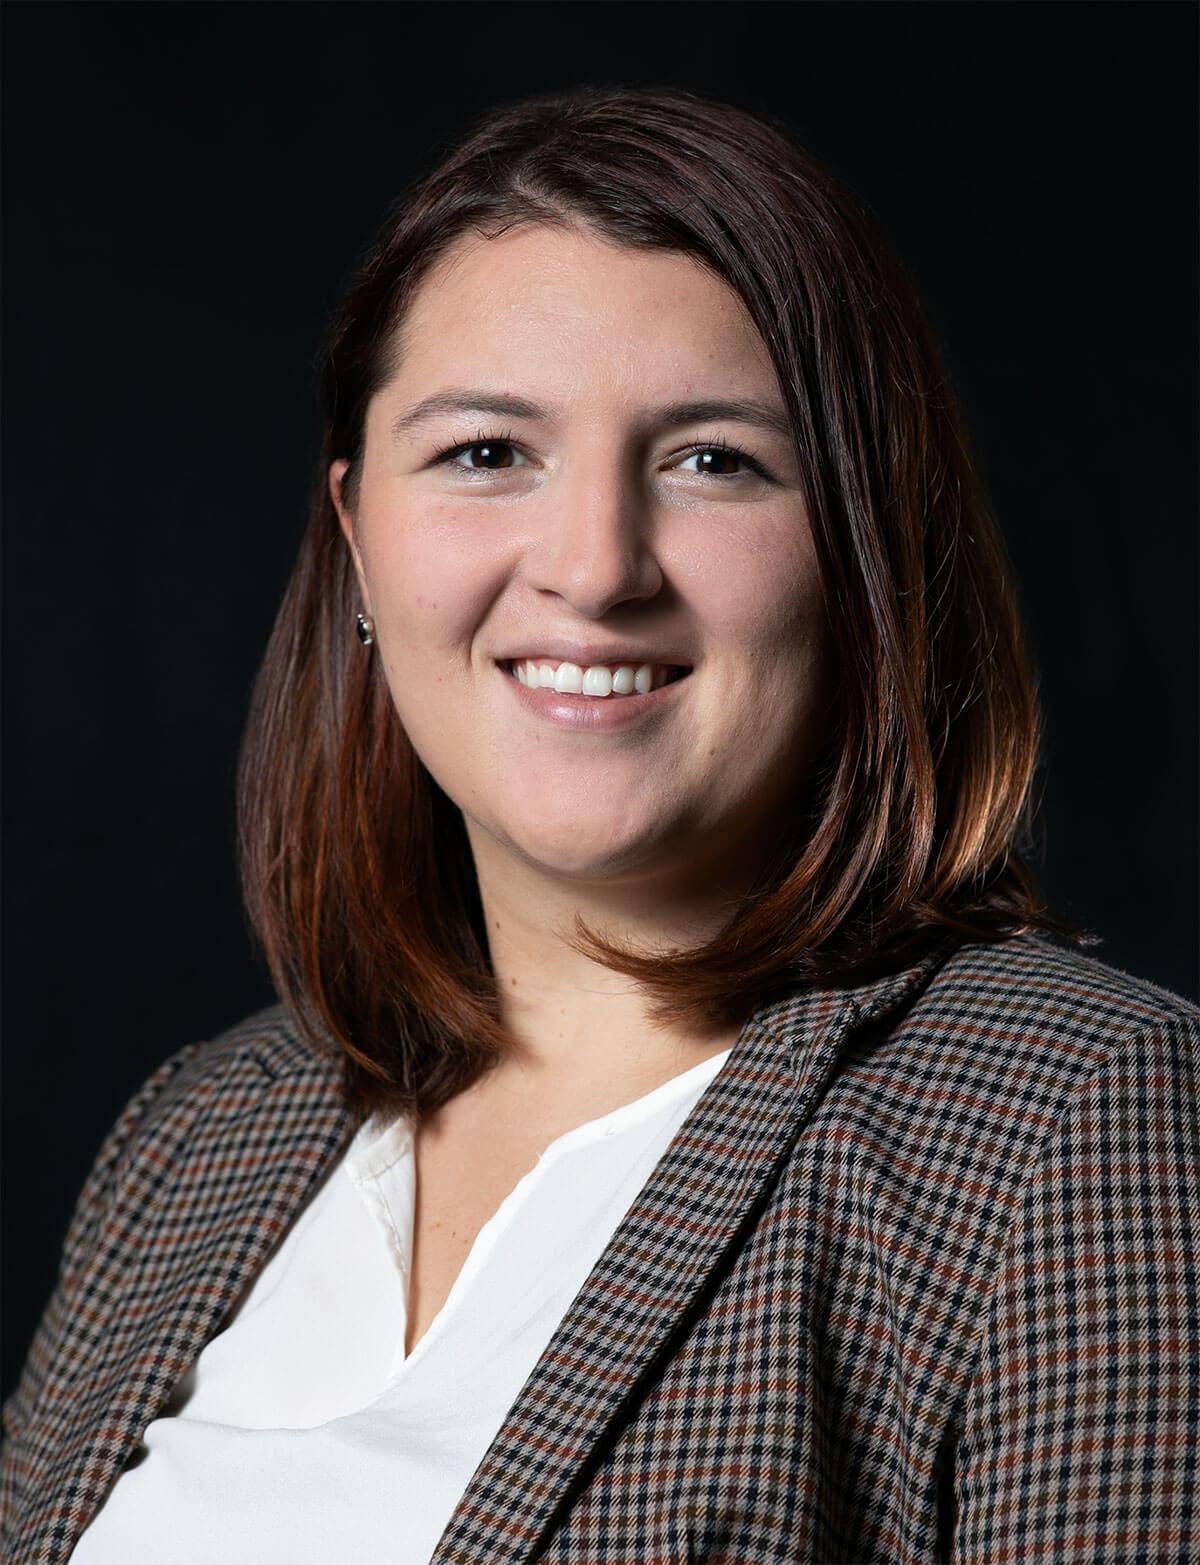 Jessica Moldovan